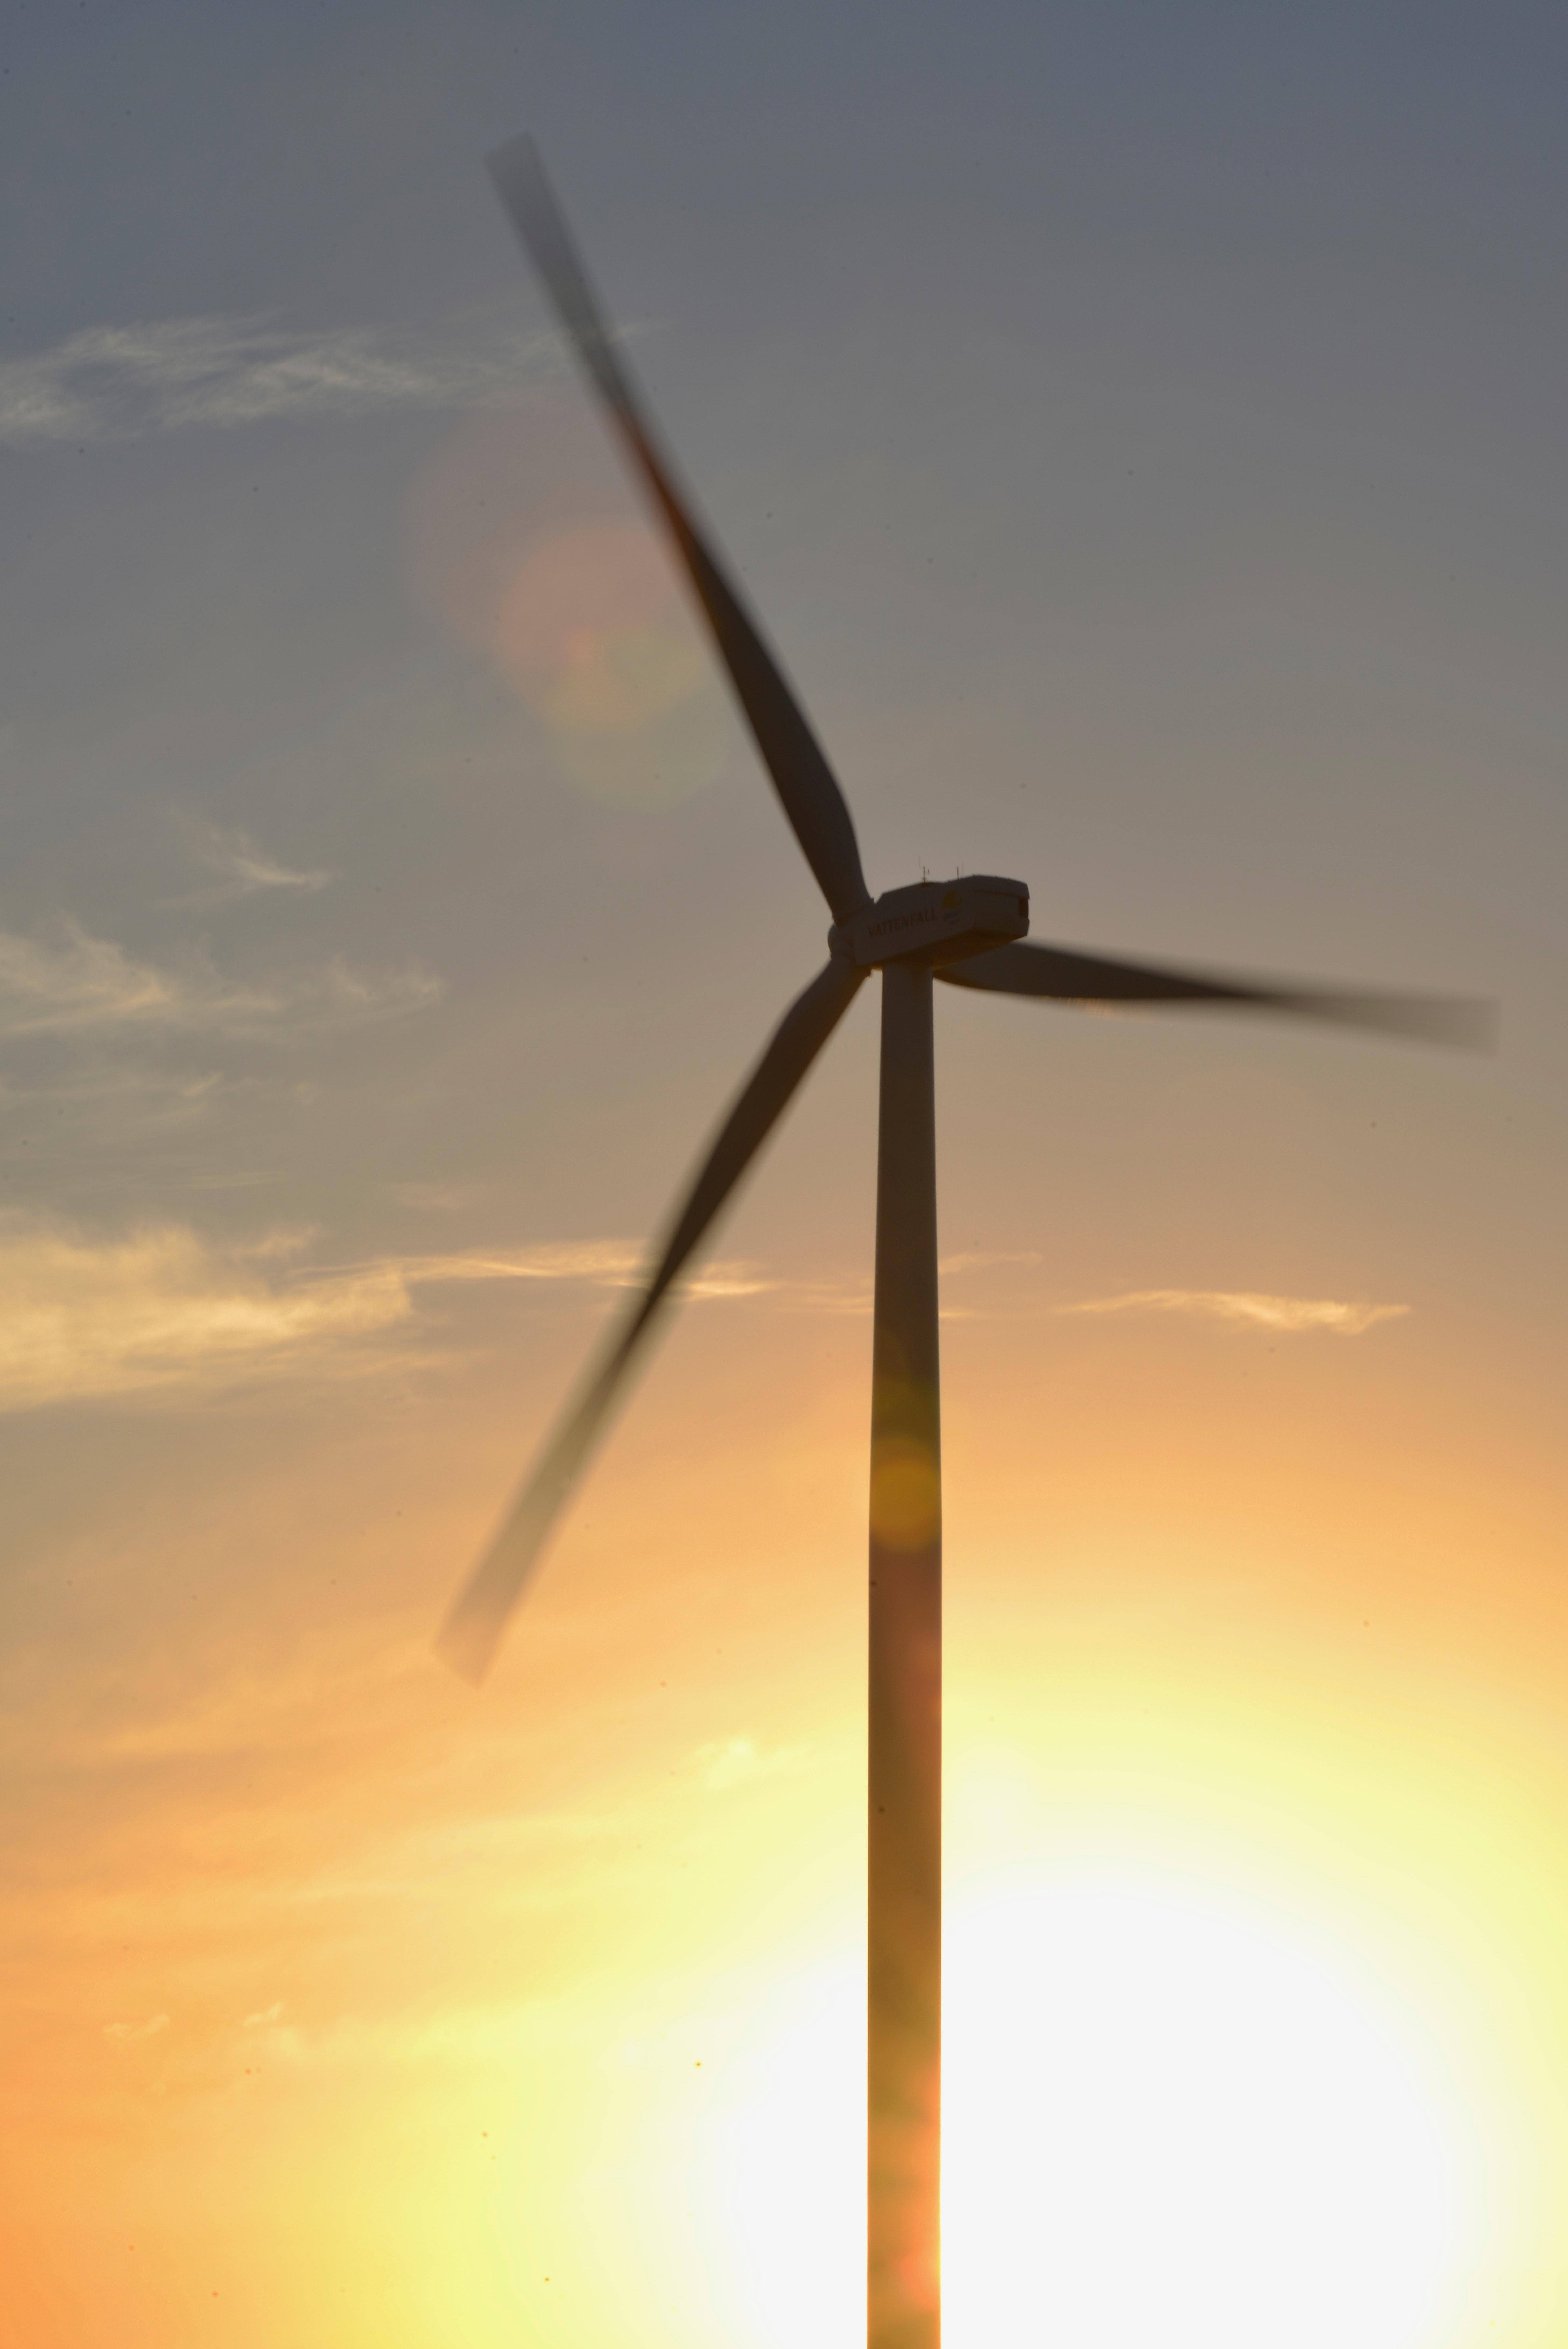 Brown 3-blade Windmill on Surise, Alternative, Production, Wind turbine, Wind power, HQ Photo